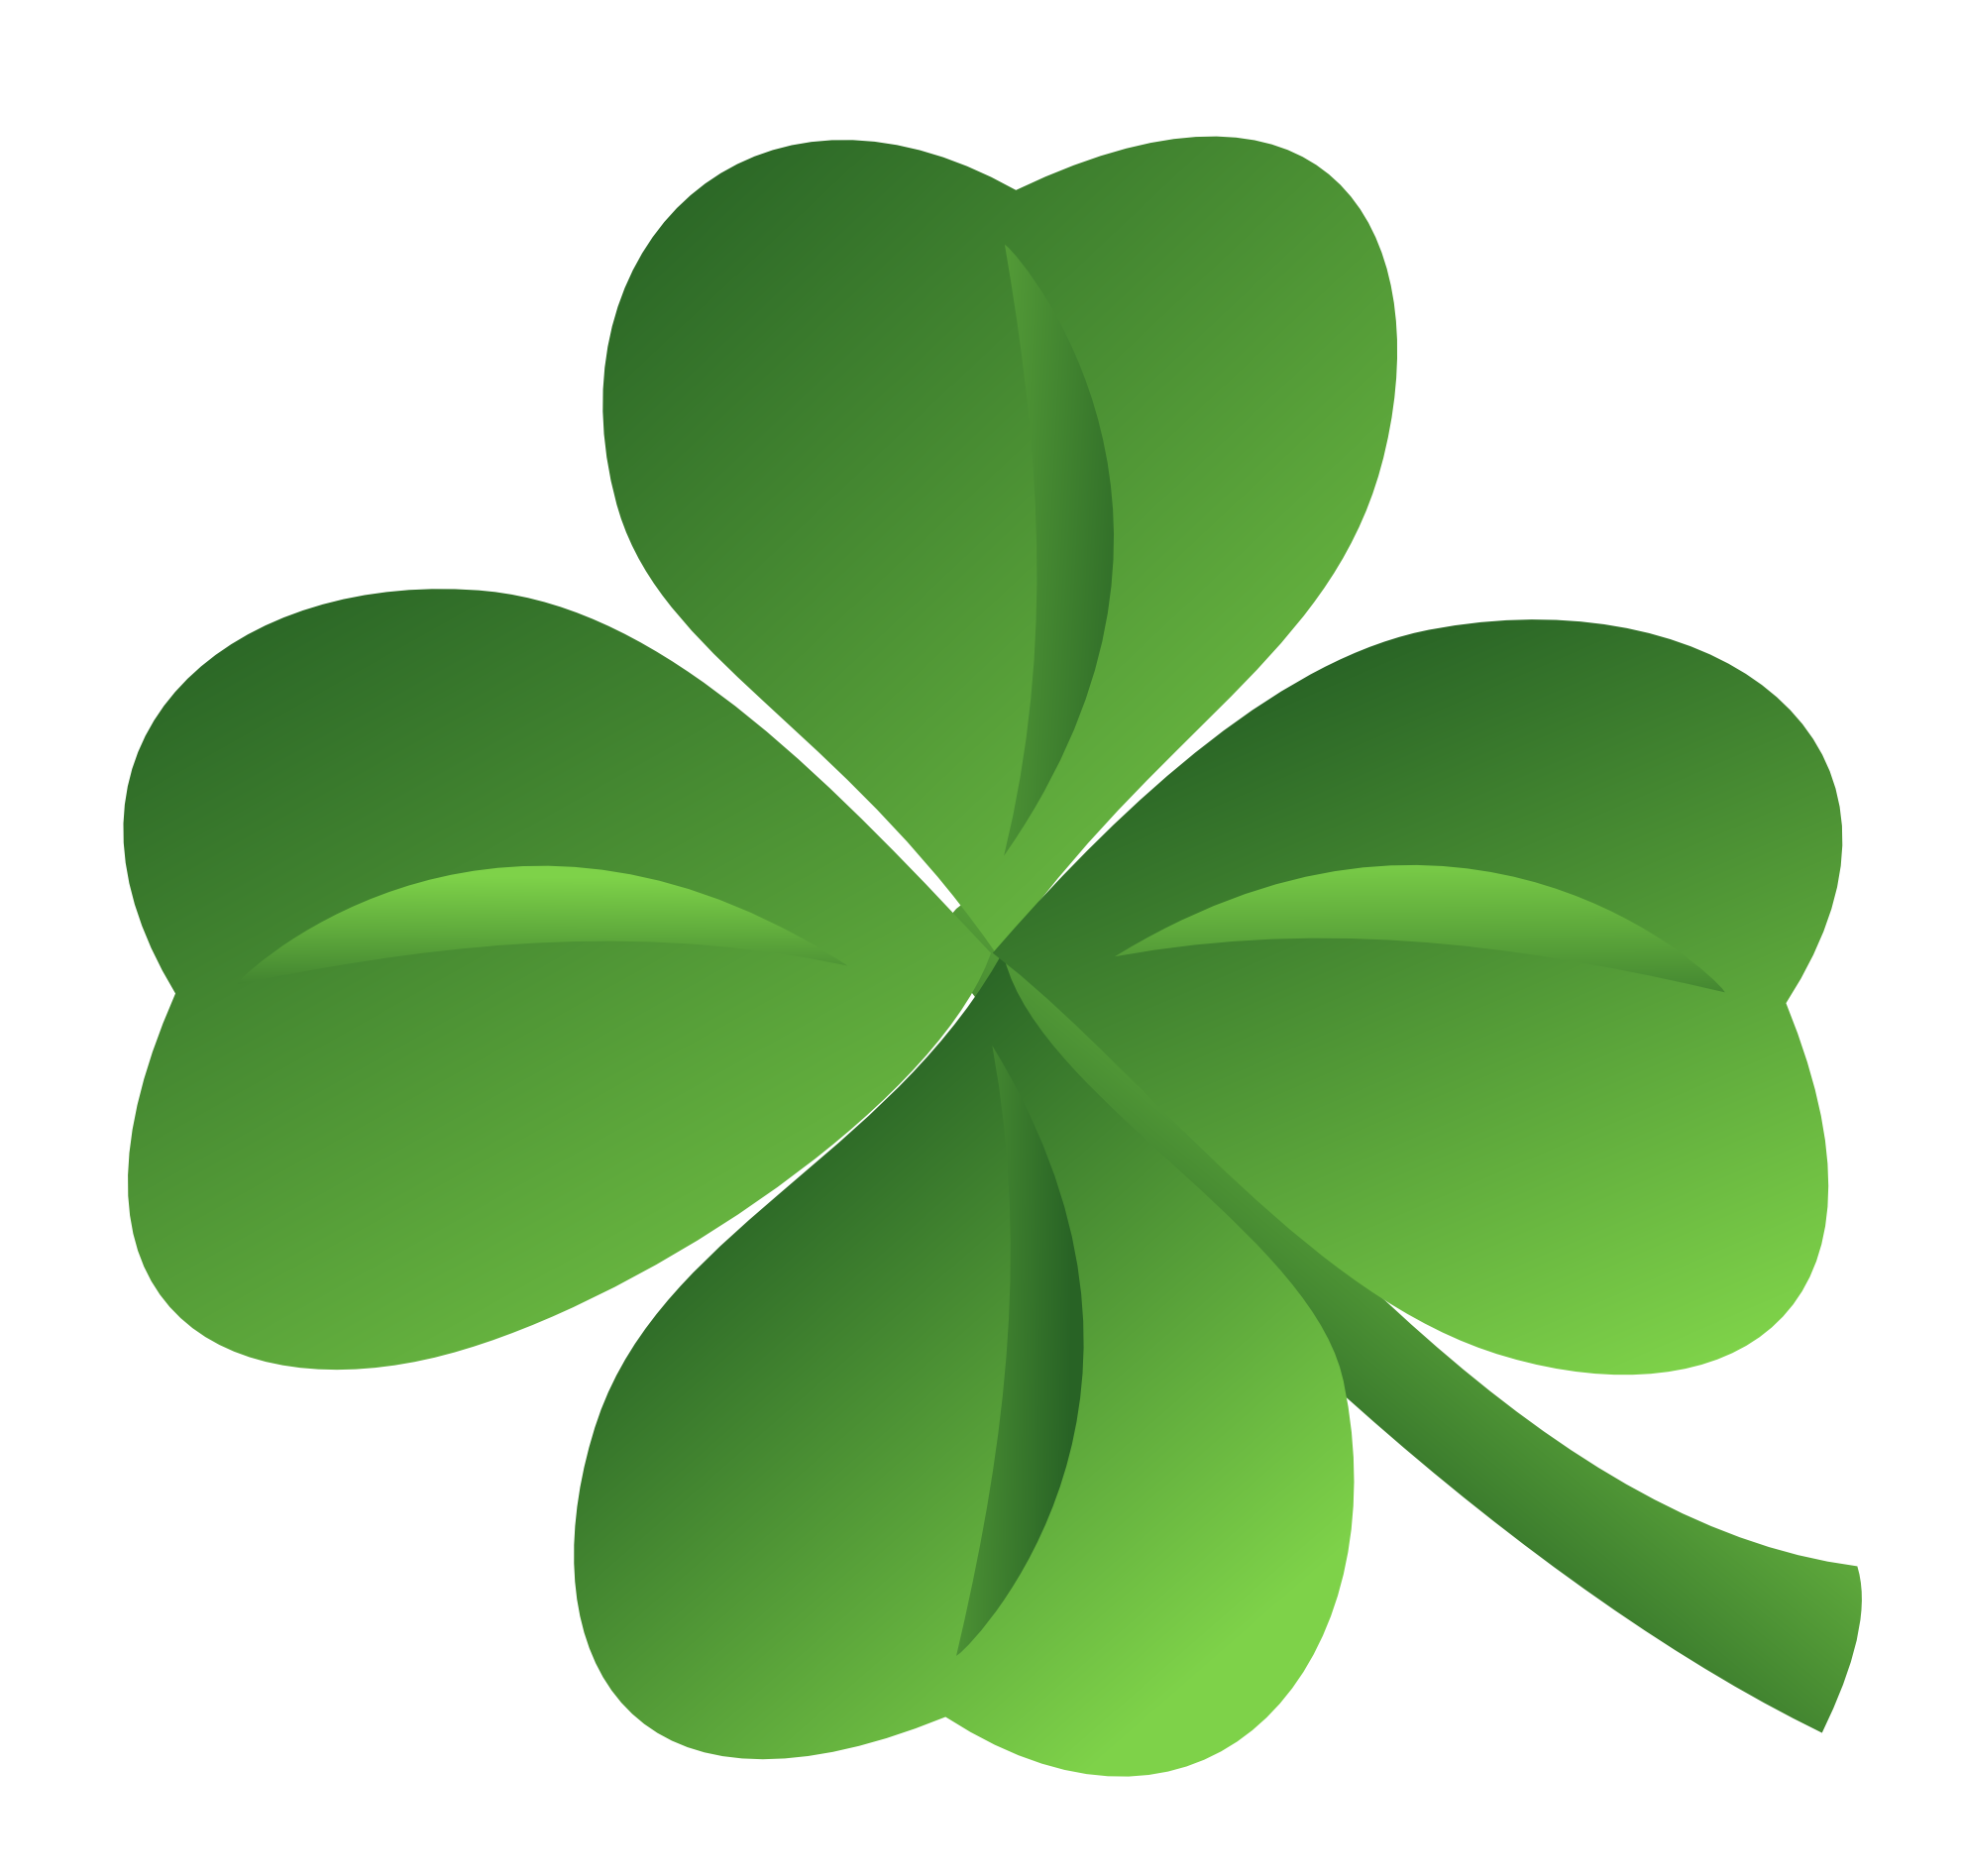 Clipartist Net Clip Art Clover Ns Saint Patricks Day Clipartist Net Saint Patricks Day Clipartist Net St Patricks Day Clipart Clover Leaf Flower Images